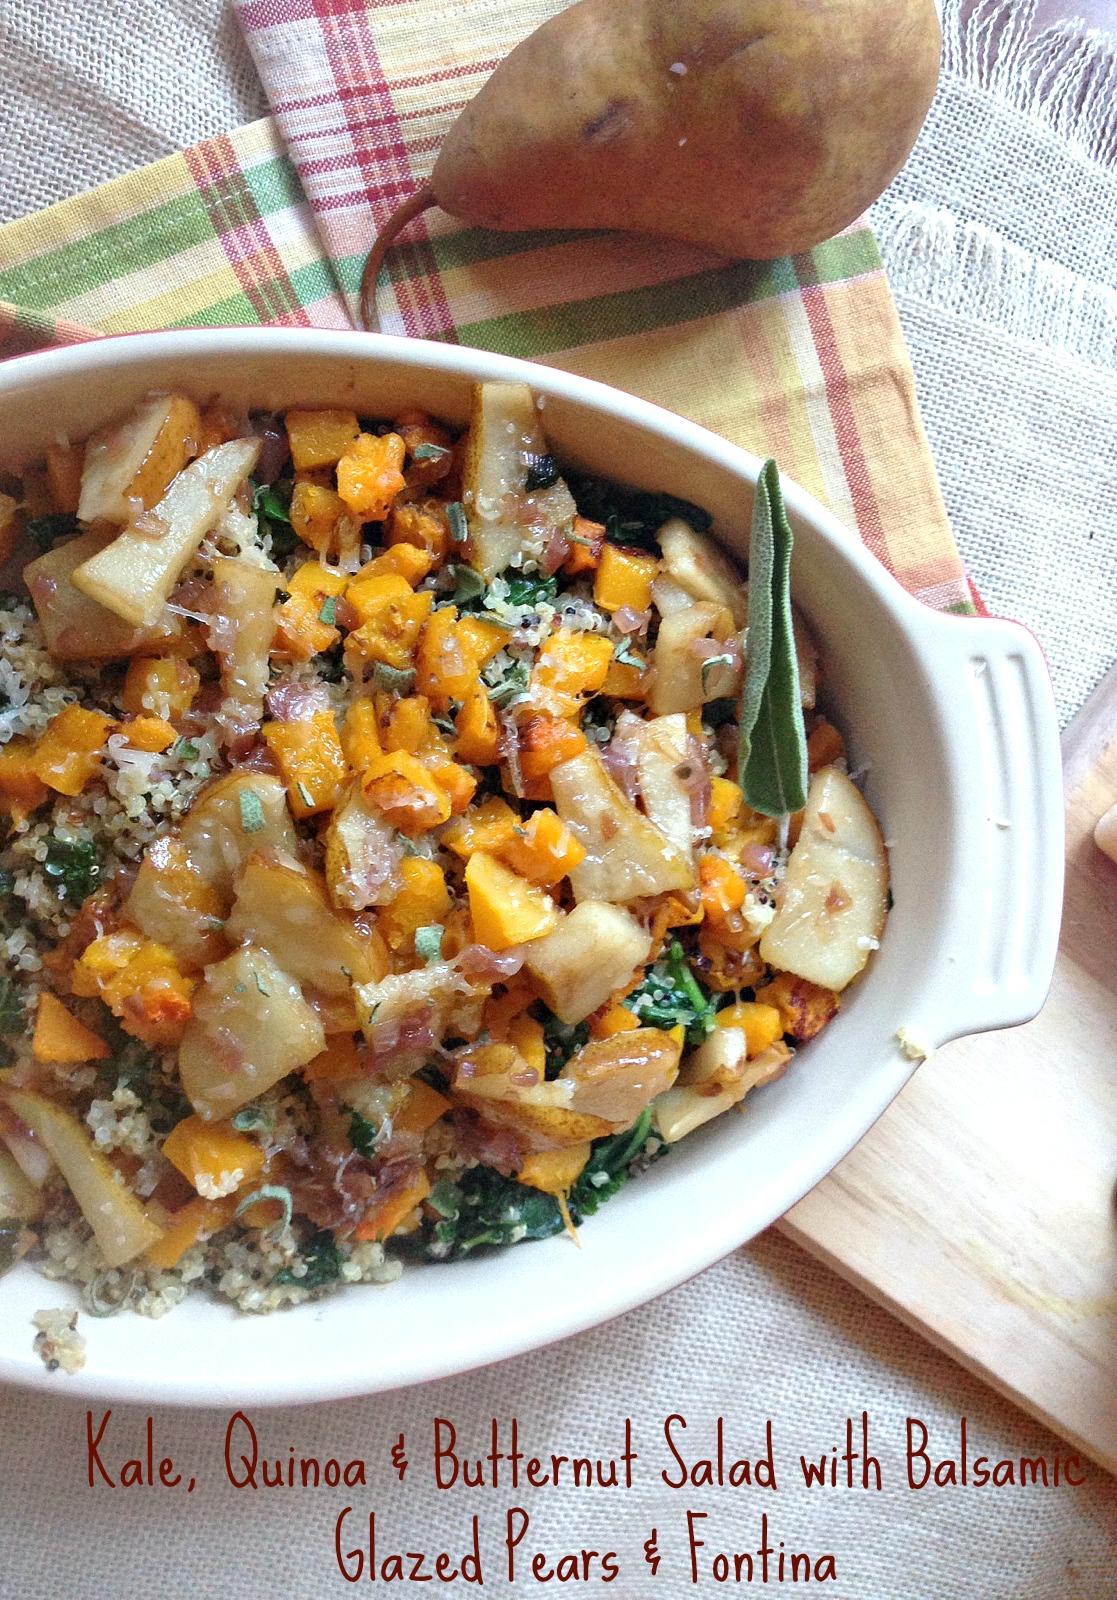 Kale, Quinoa & Butternut Salad with Balsamic-Glazed Pears & Fontina